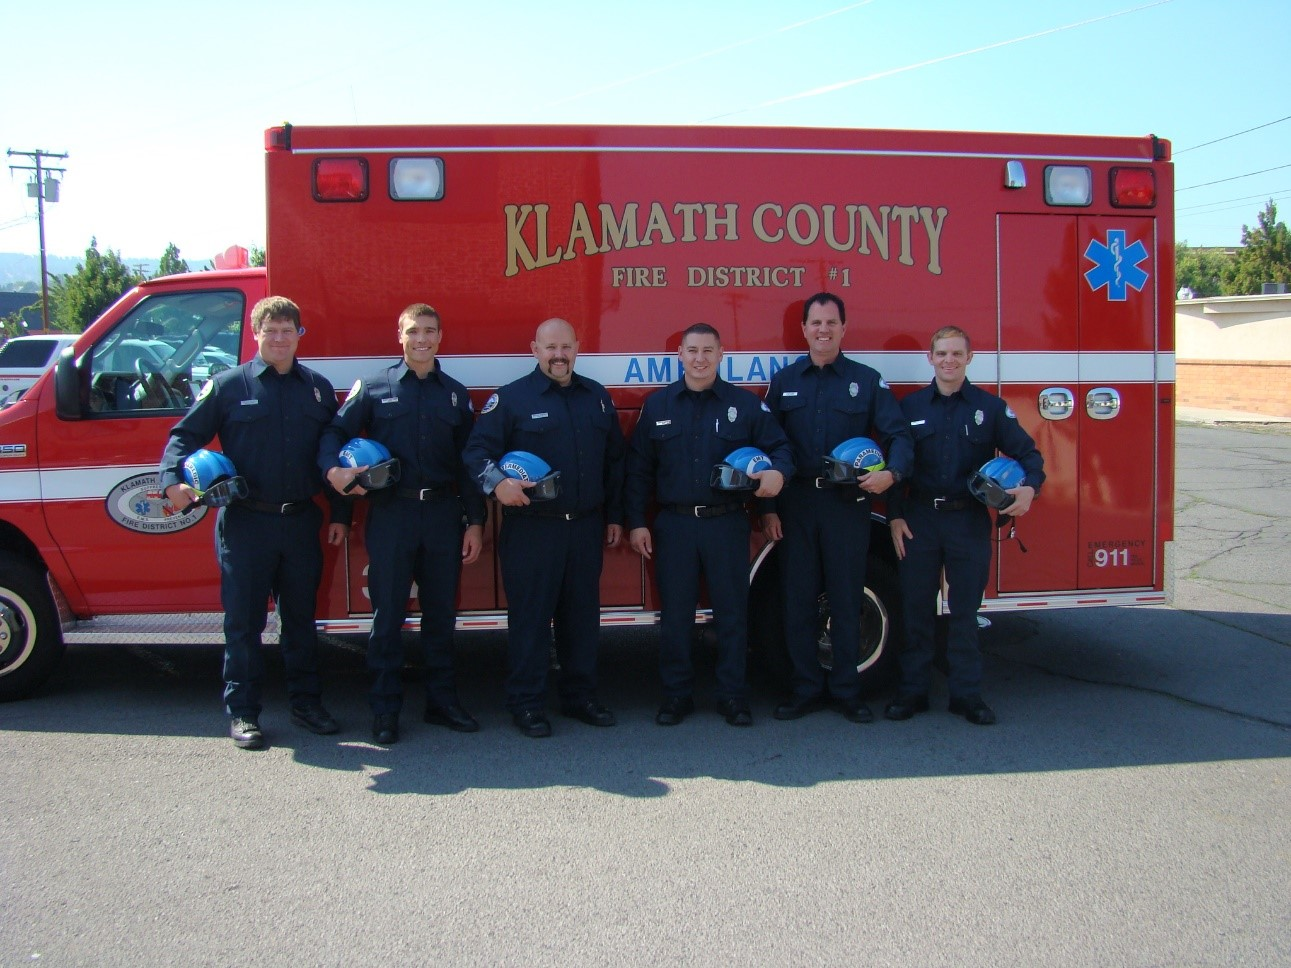 Image: Klamath County Fire District No. 1 - 2017 EMS Academy Graduates. (L to R) Colton Steinke, Layne Westwang, Wayland Sherman, Justin Llanes, Jade Ames, and Jared Hooper